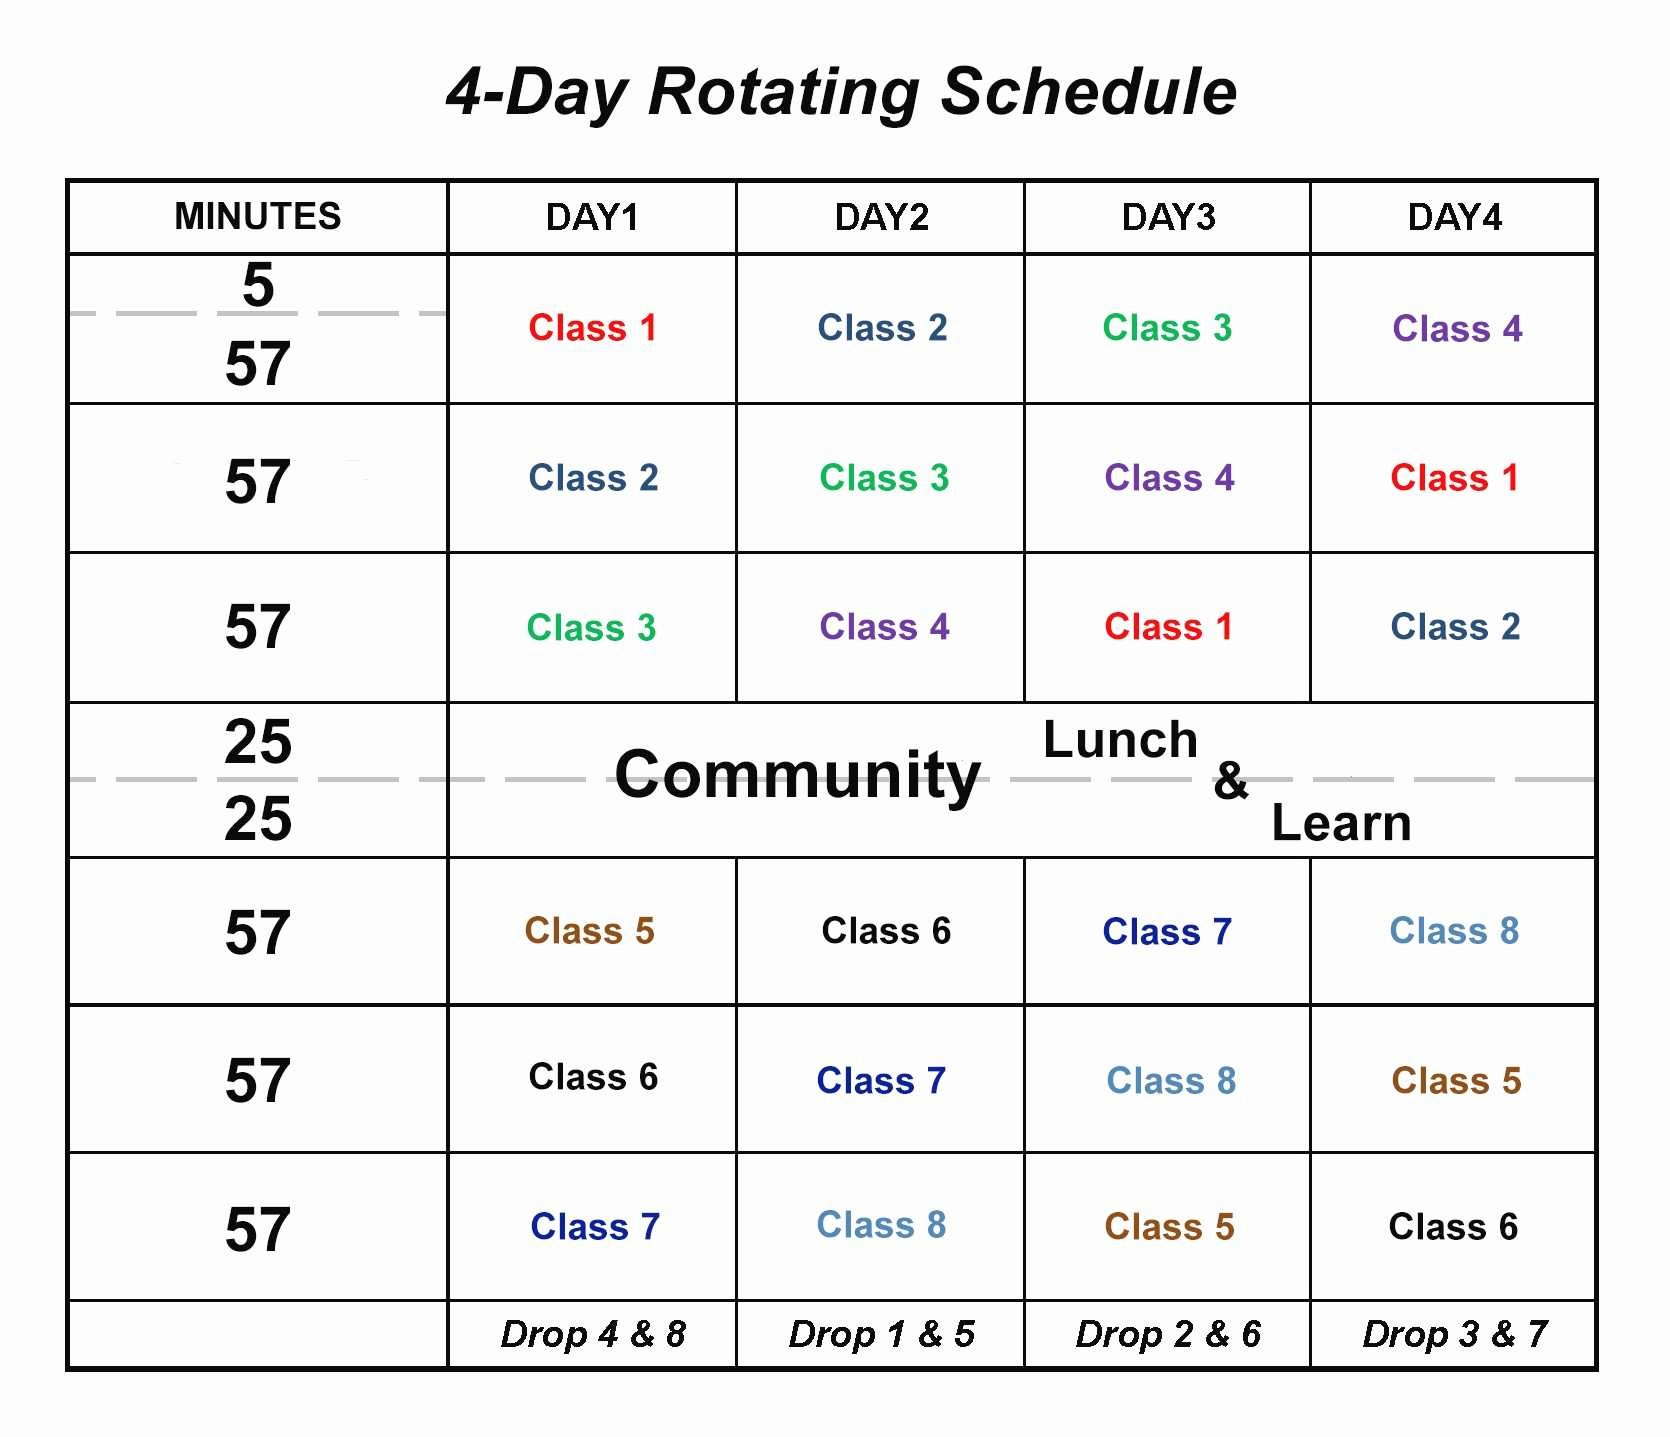 Rotating Shift Schedule Template Beautiful Monthly Rotating Shift Schedule Template Beautiful